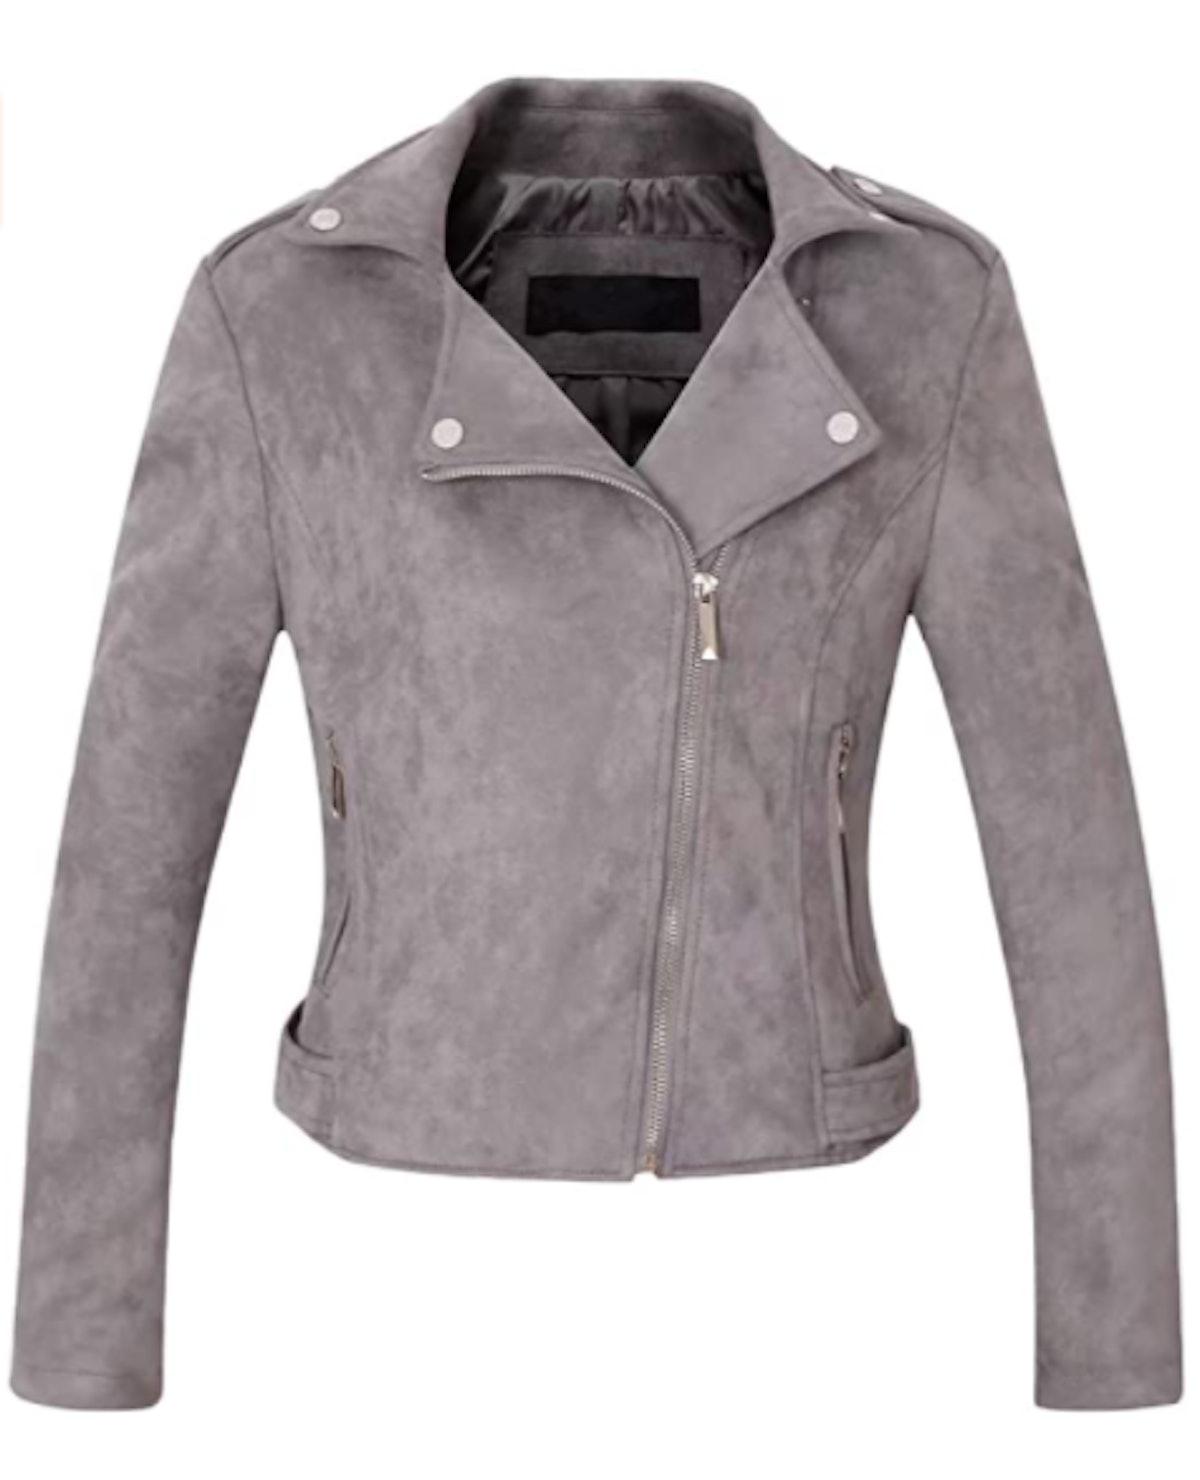 CHARTOU Suede Leather Moto Jacket